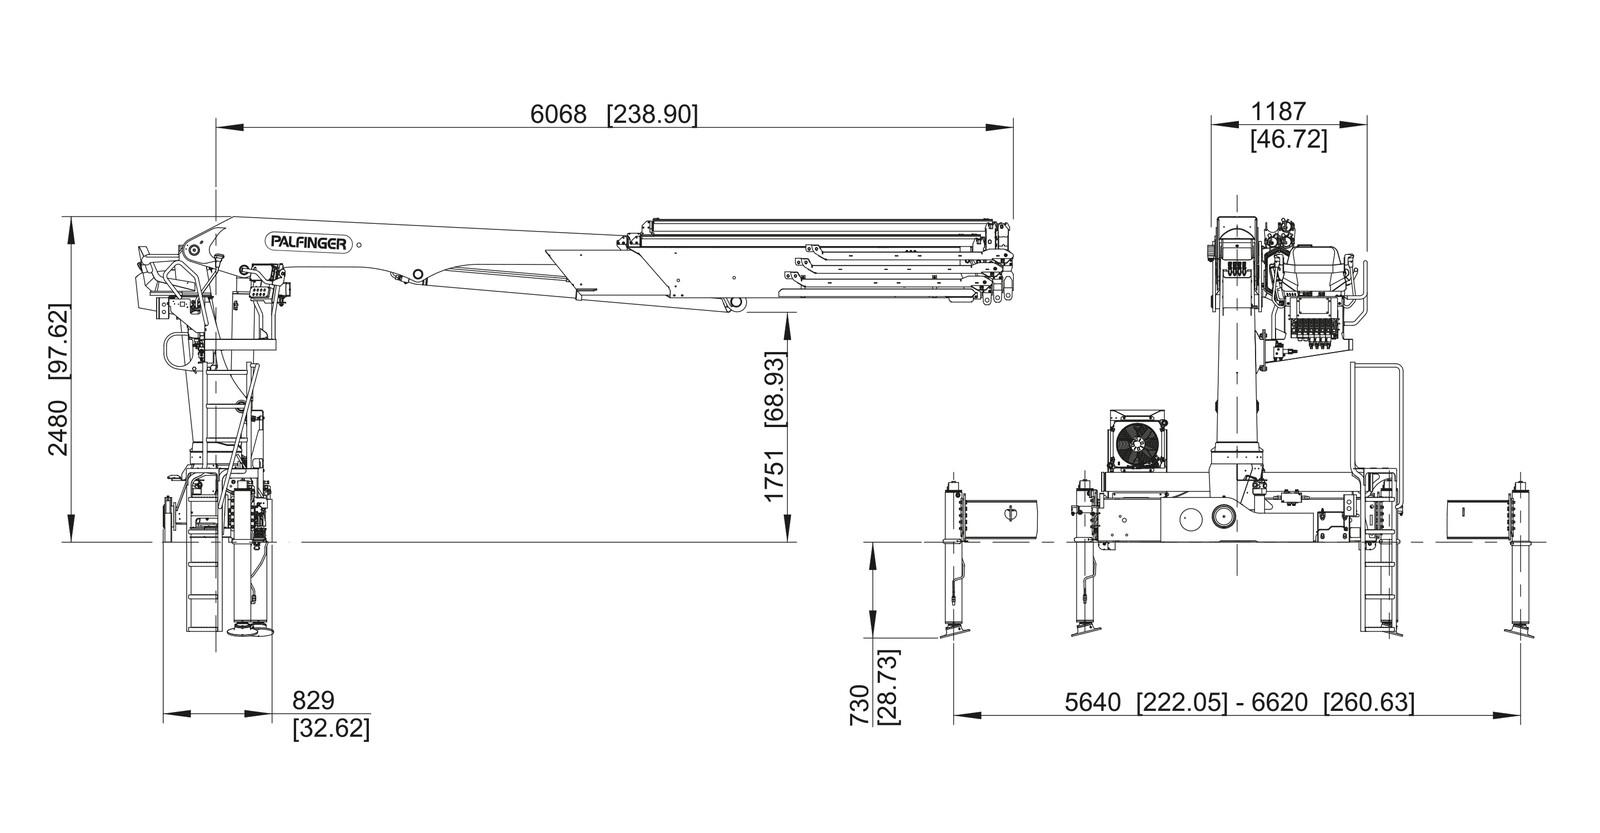 palfinger wiring diagrams data wiring diagram blog palfinger wiring diagrams wiring diagram data royal wiring diagrams palfinger boom wiring diagram schema wiring diagrams